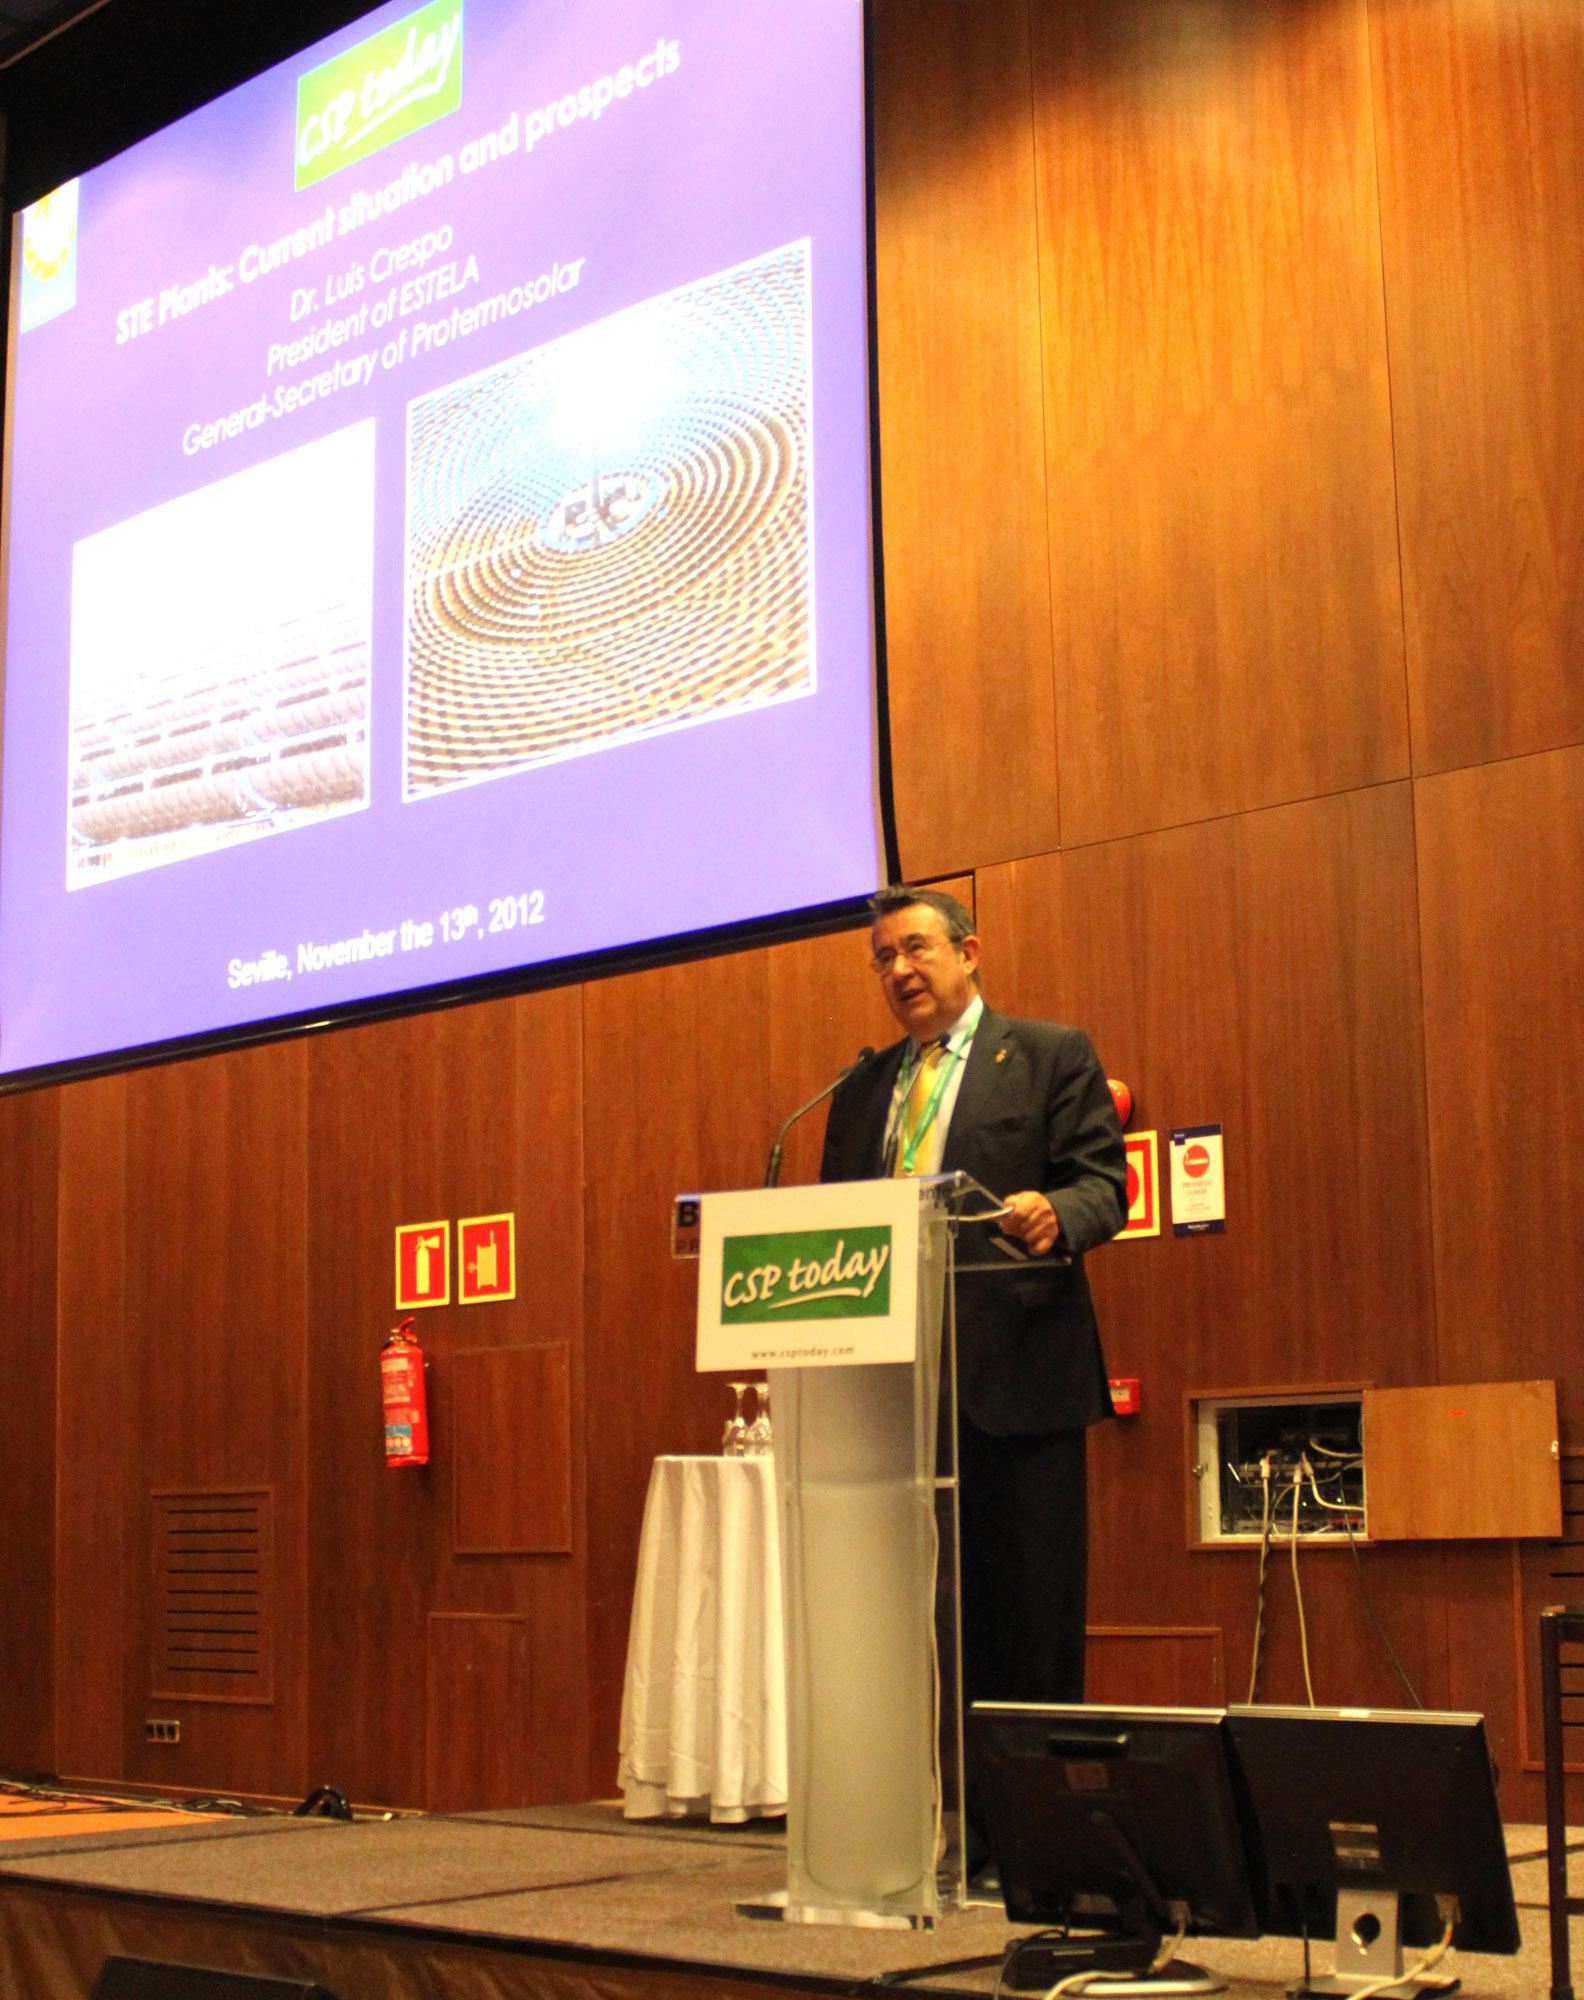 VI Cumbre Internacional del sector termosolar en Sevilla. Premio especial de csp today a protermosolar